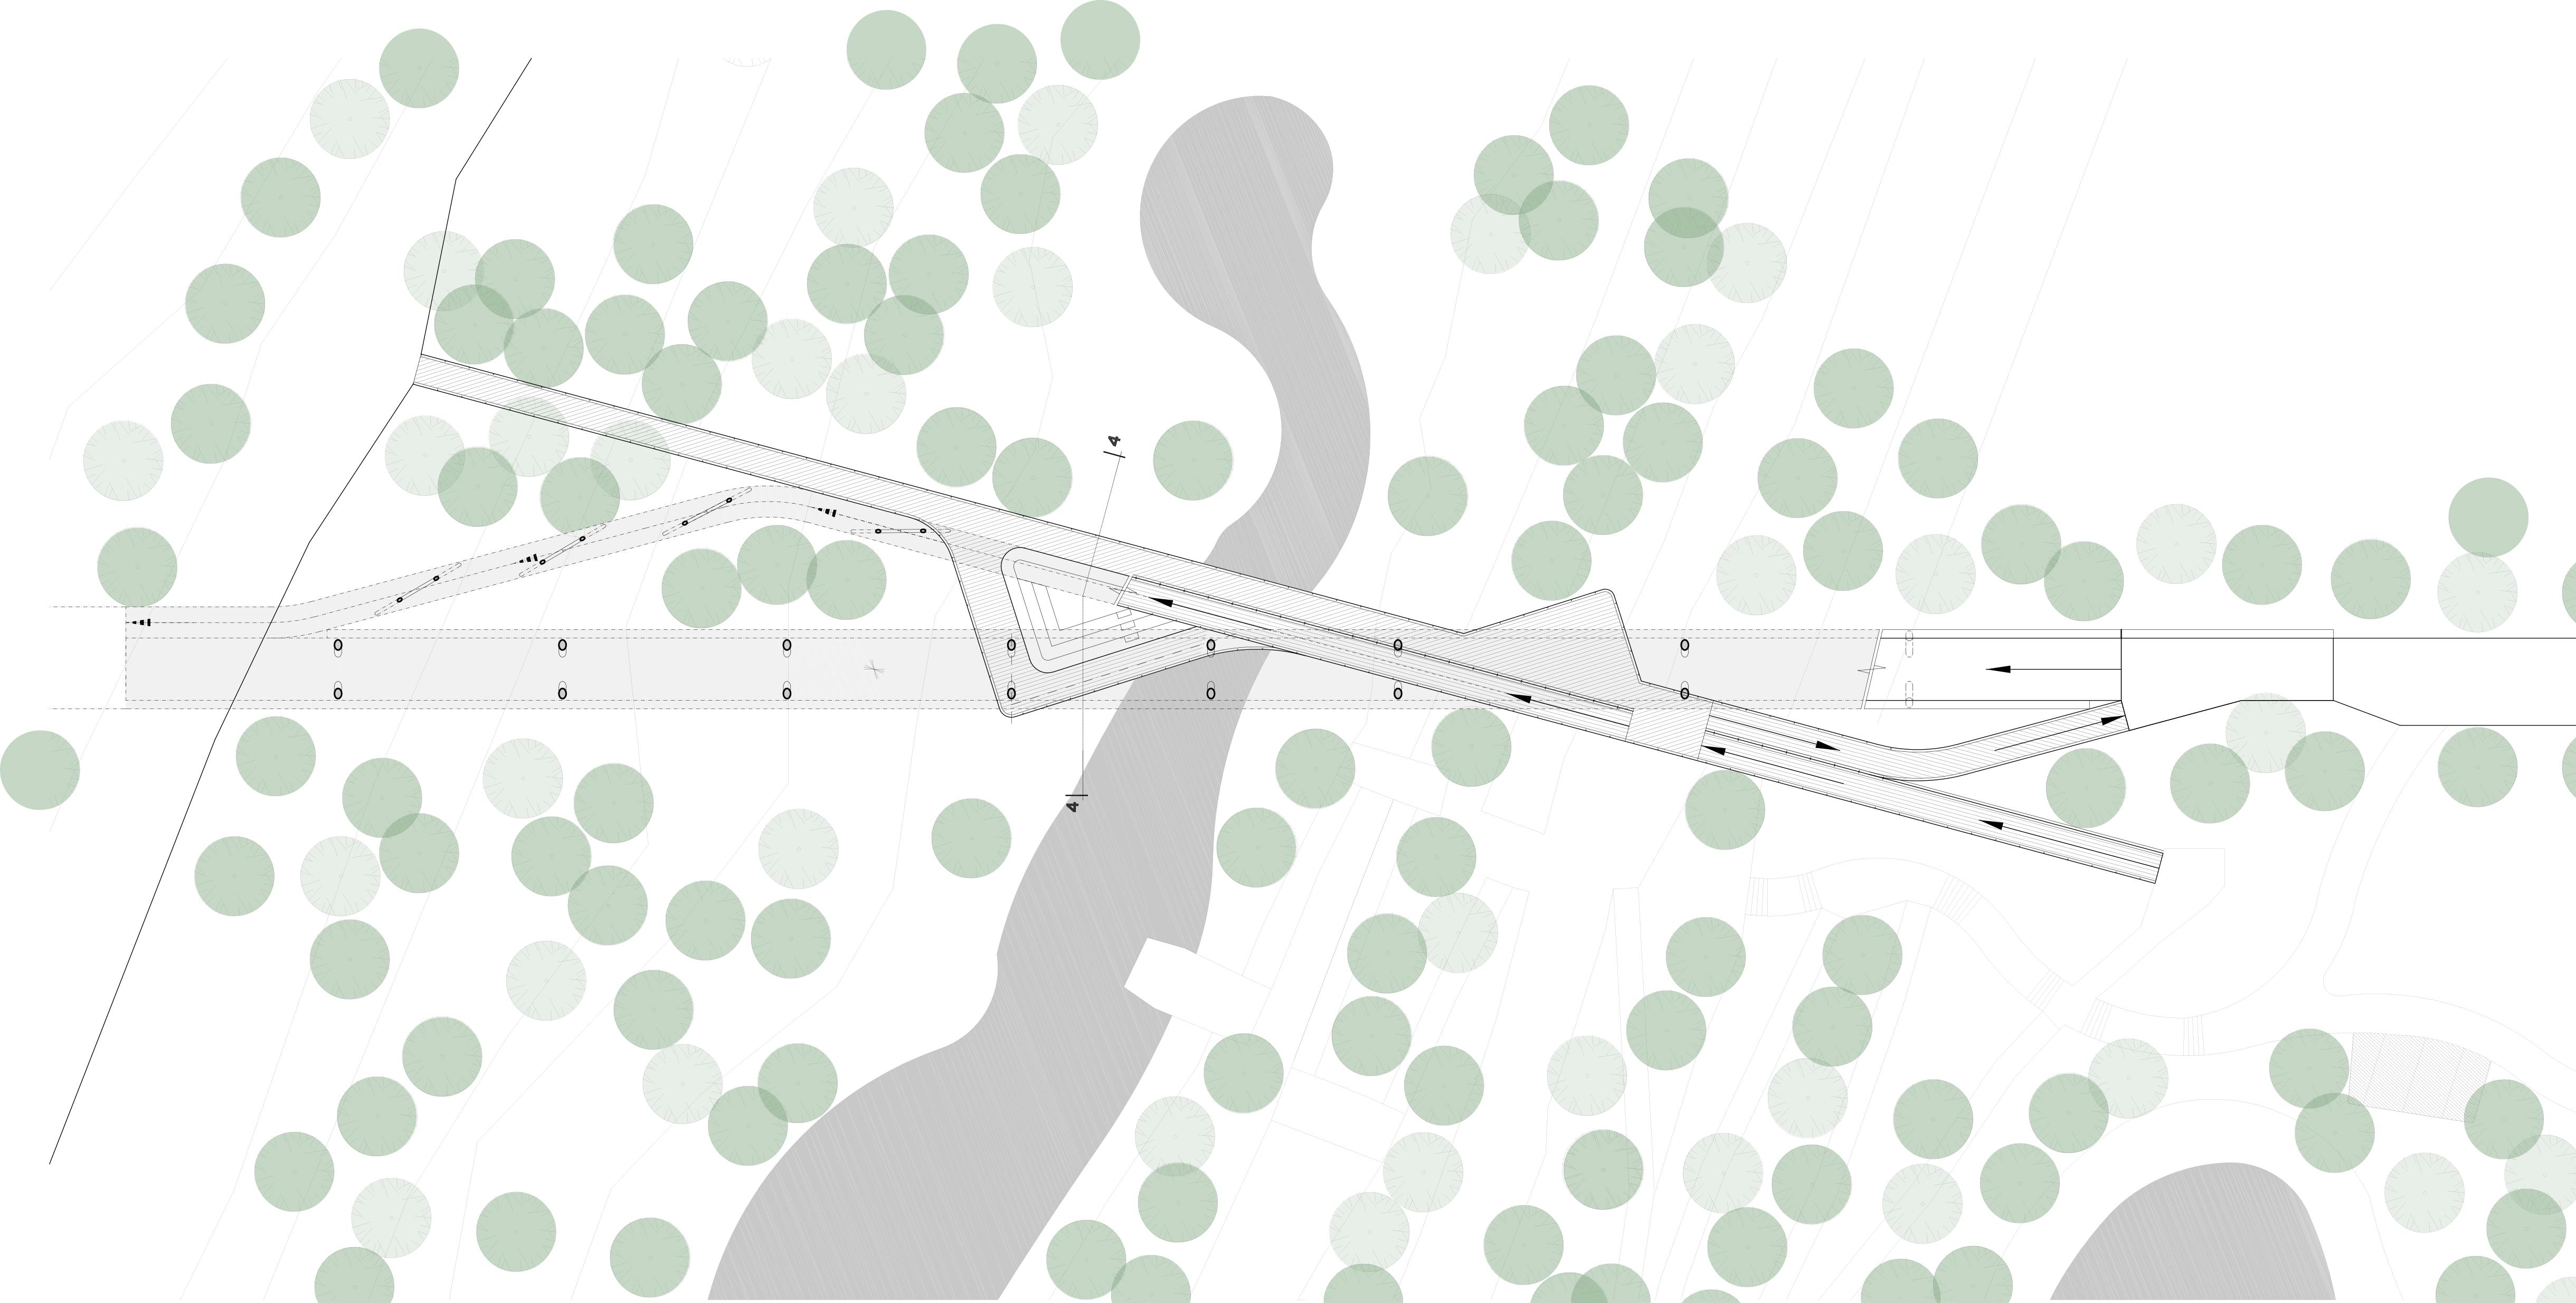 Ariel Sharon Bridge plan